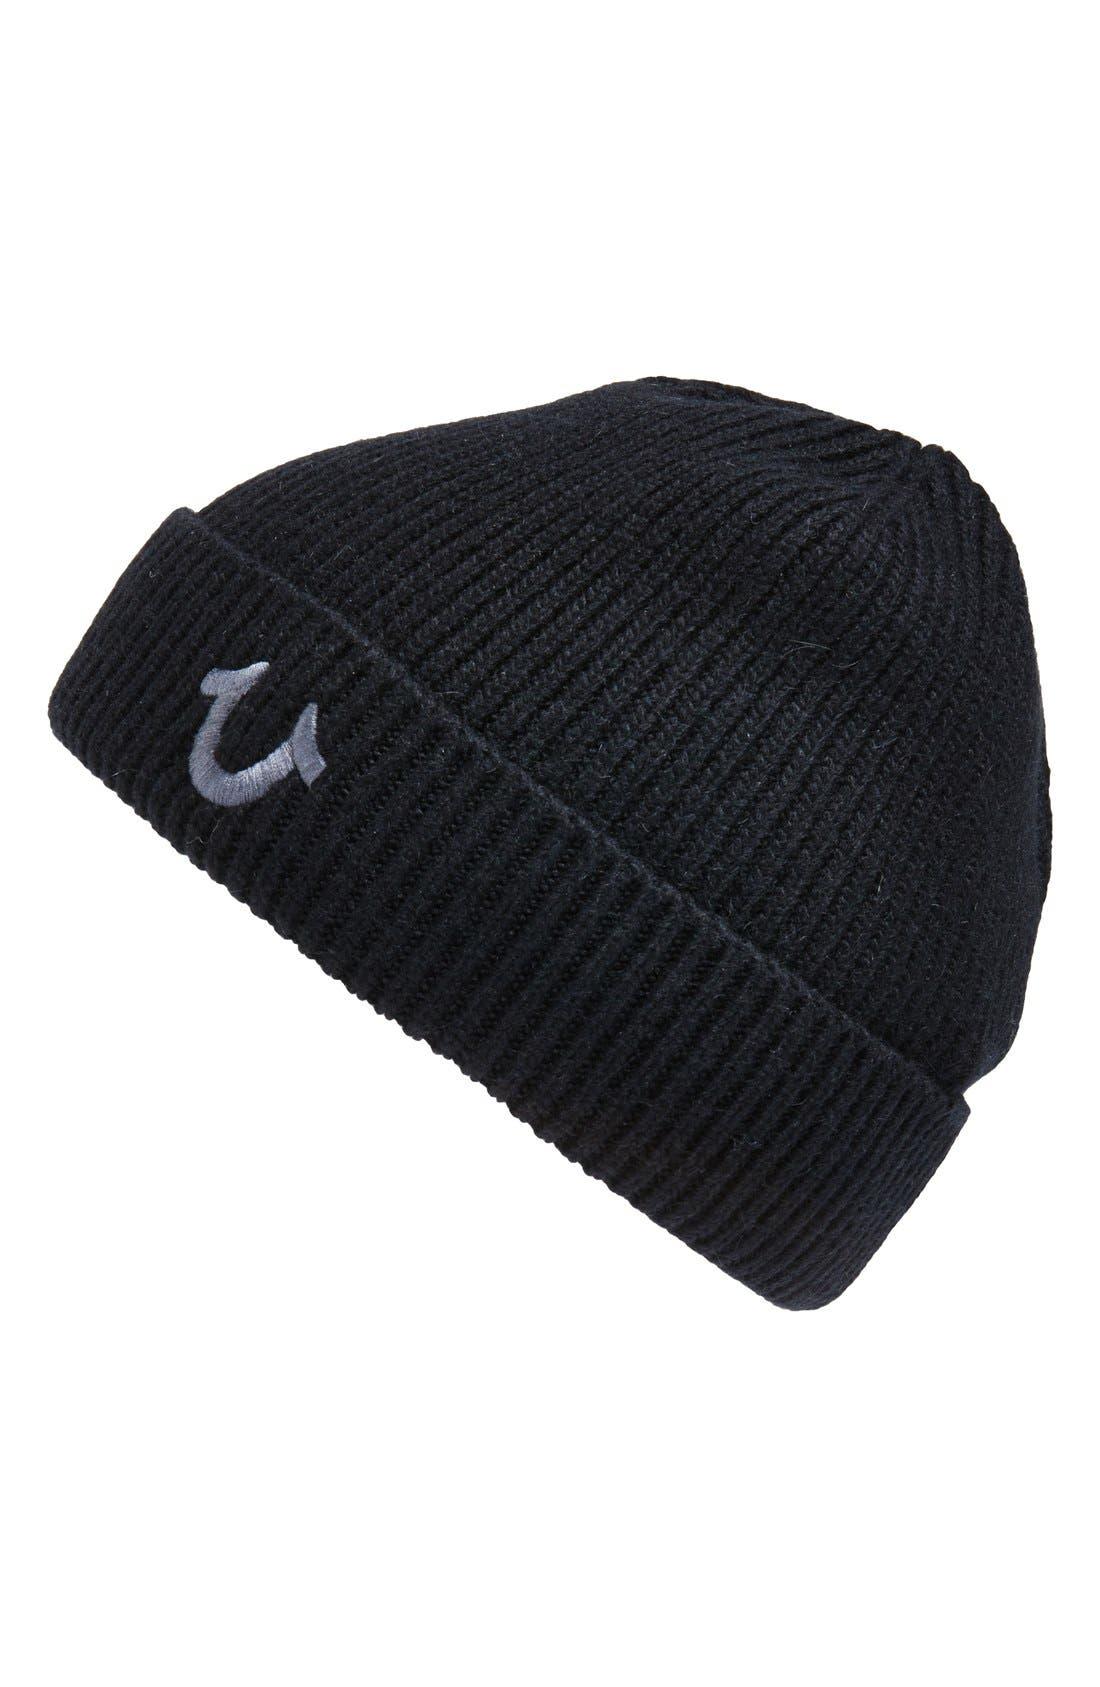 Rib Knit Cap,                         Main,                         color, 001